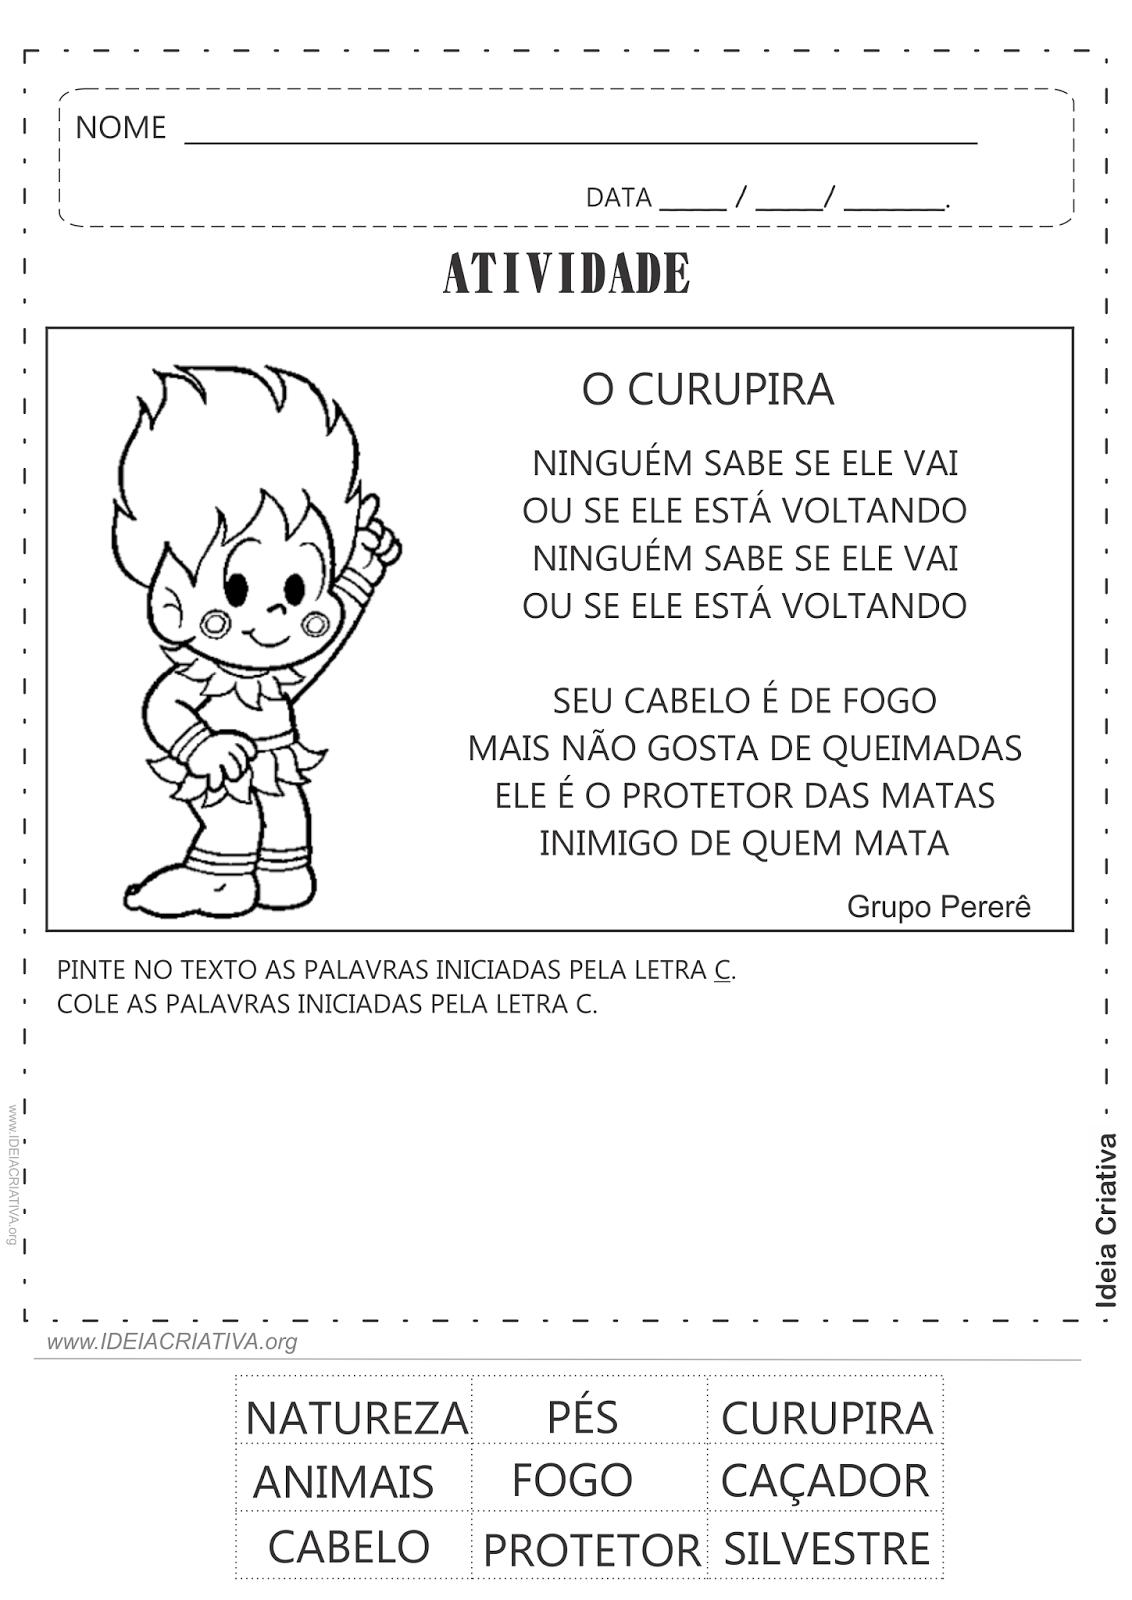 Atividade O Curupira Folclore Letra C